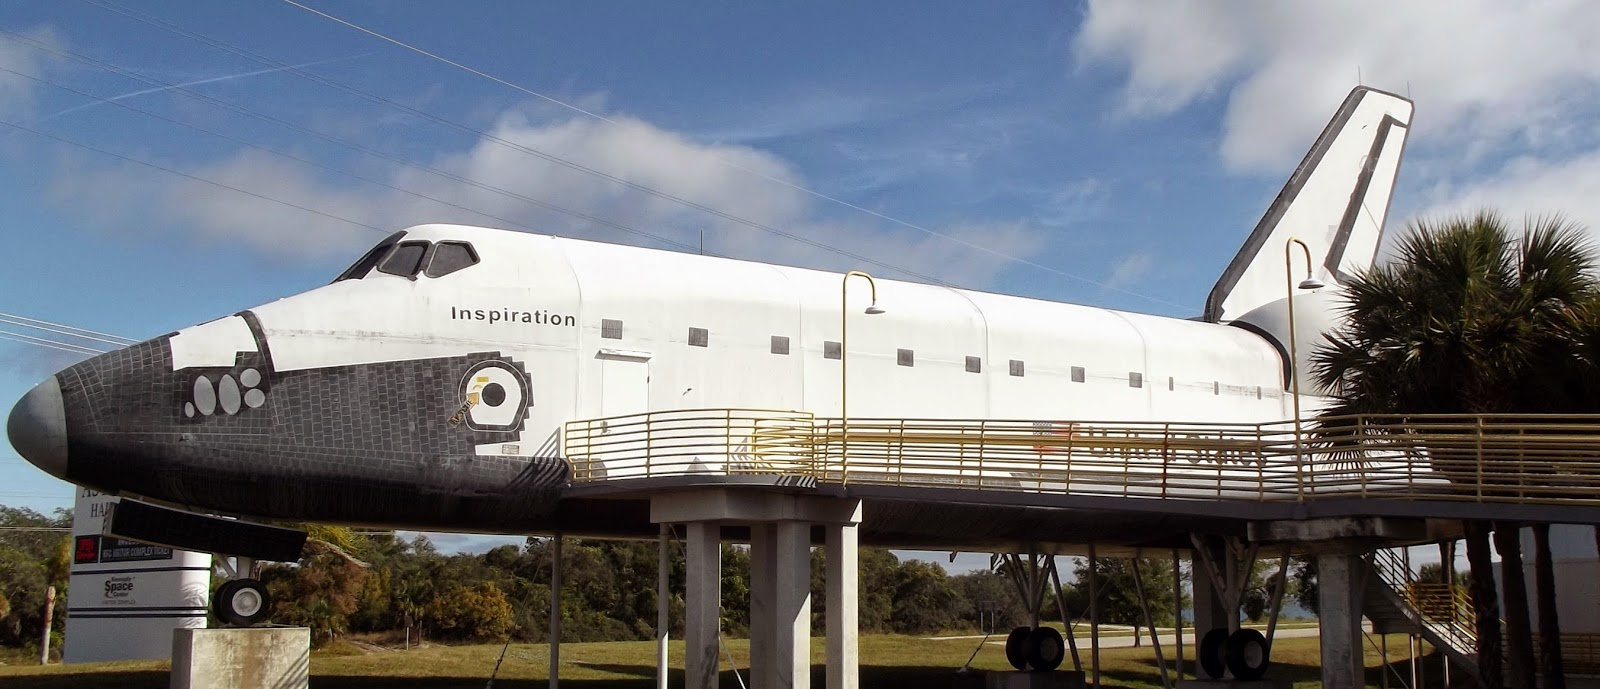 Atlas V (AFSPC-5, X37-B, Lightsail-A) - 20.05.2015 - Page 6 86673126navette